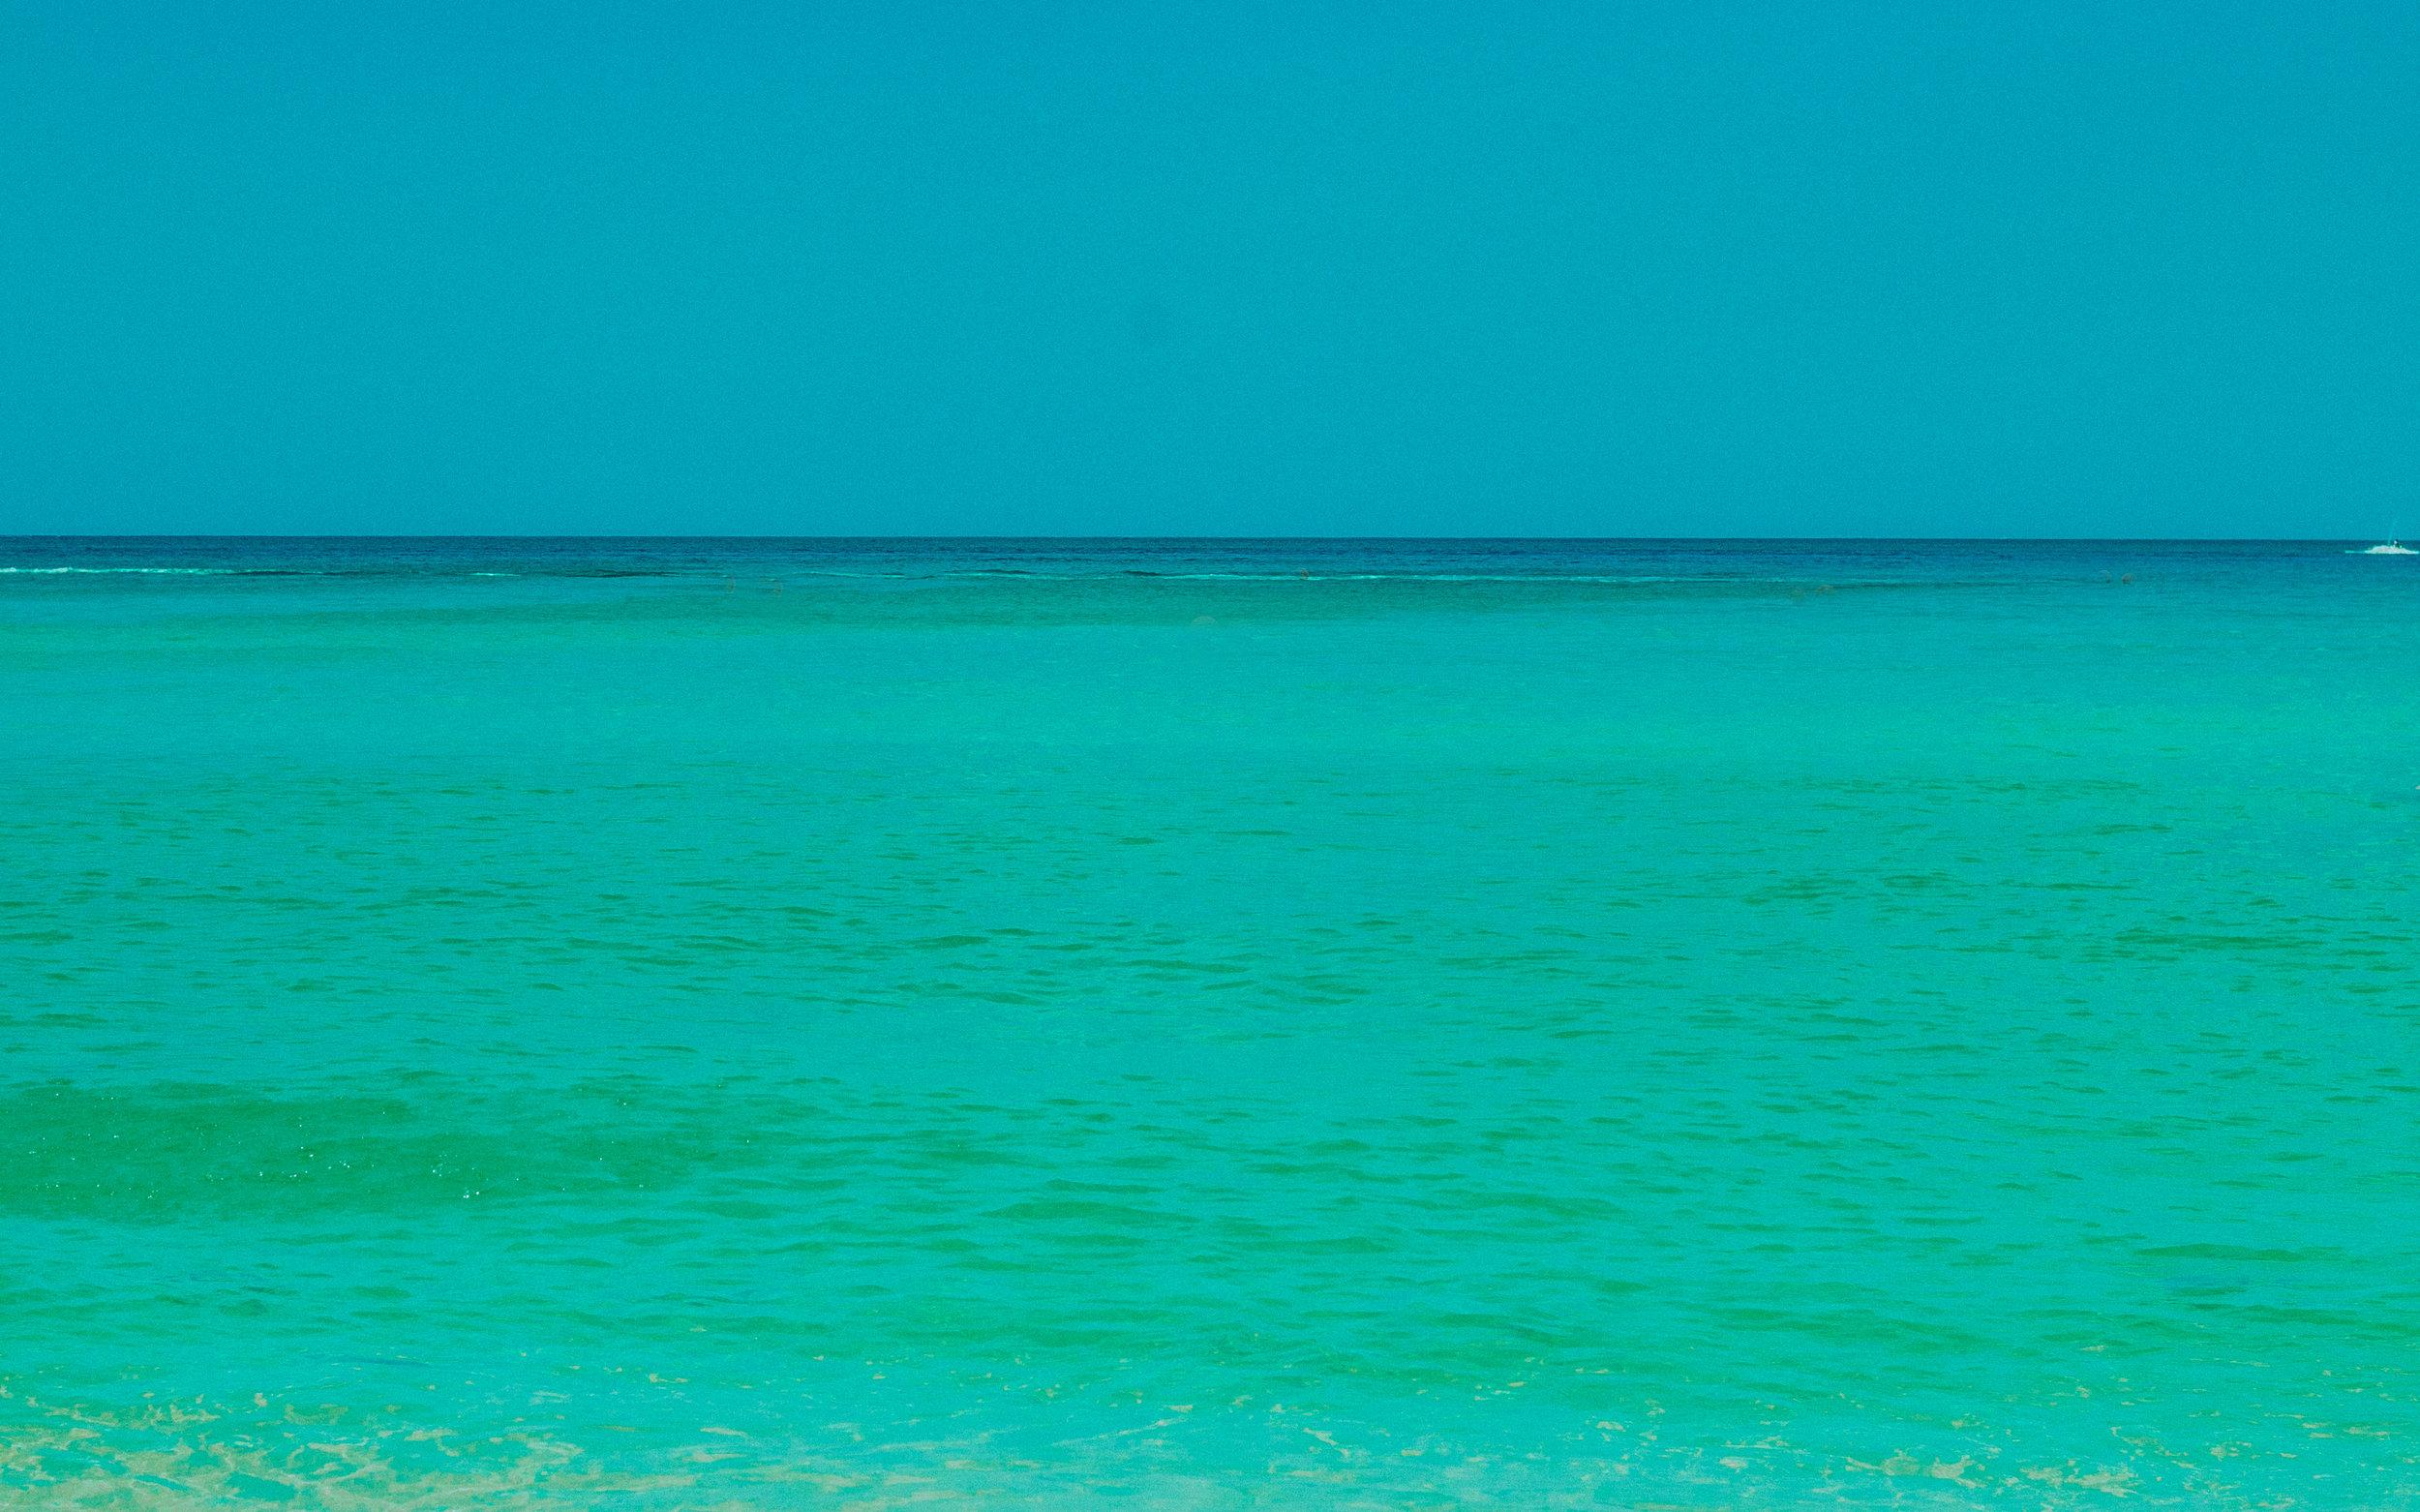 MY PHOTO: SOUTH BEACH, MIAMI